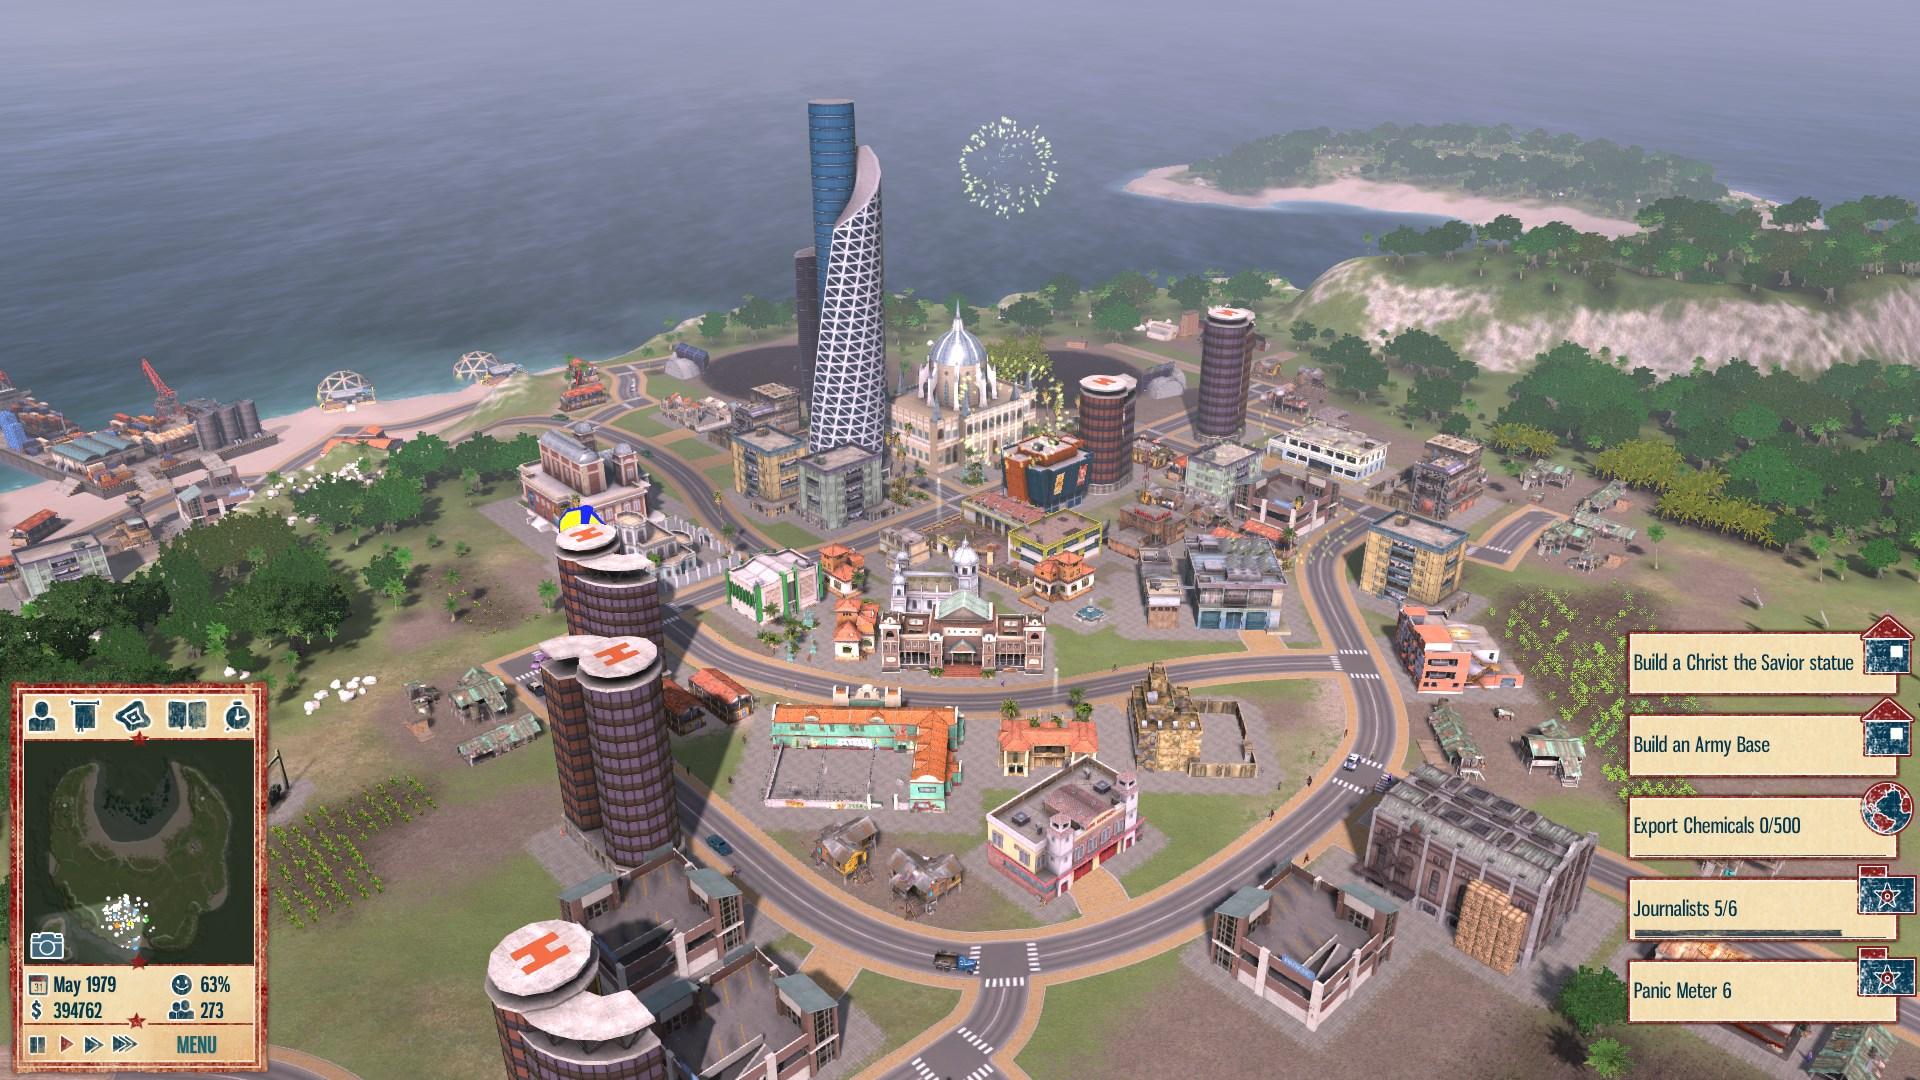 HQ Tropico 4 Wallpapers | File 559.47Kb